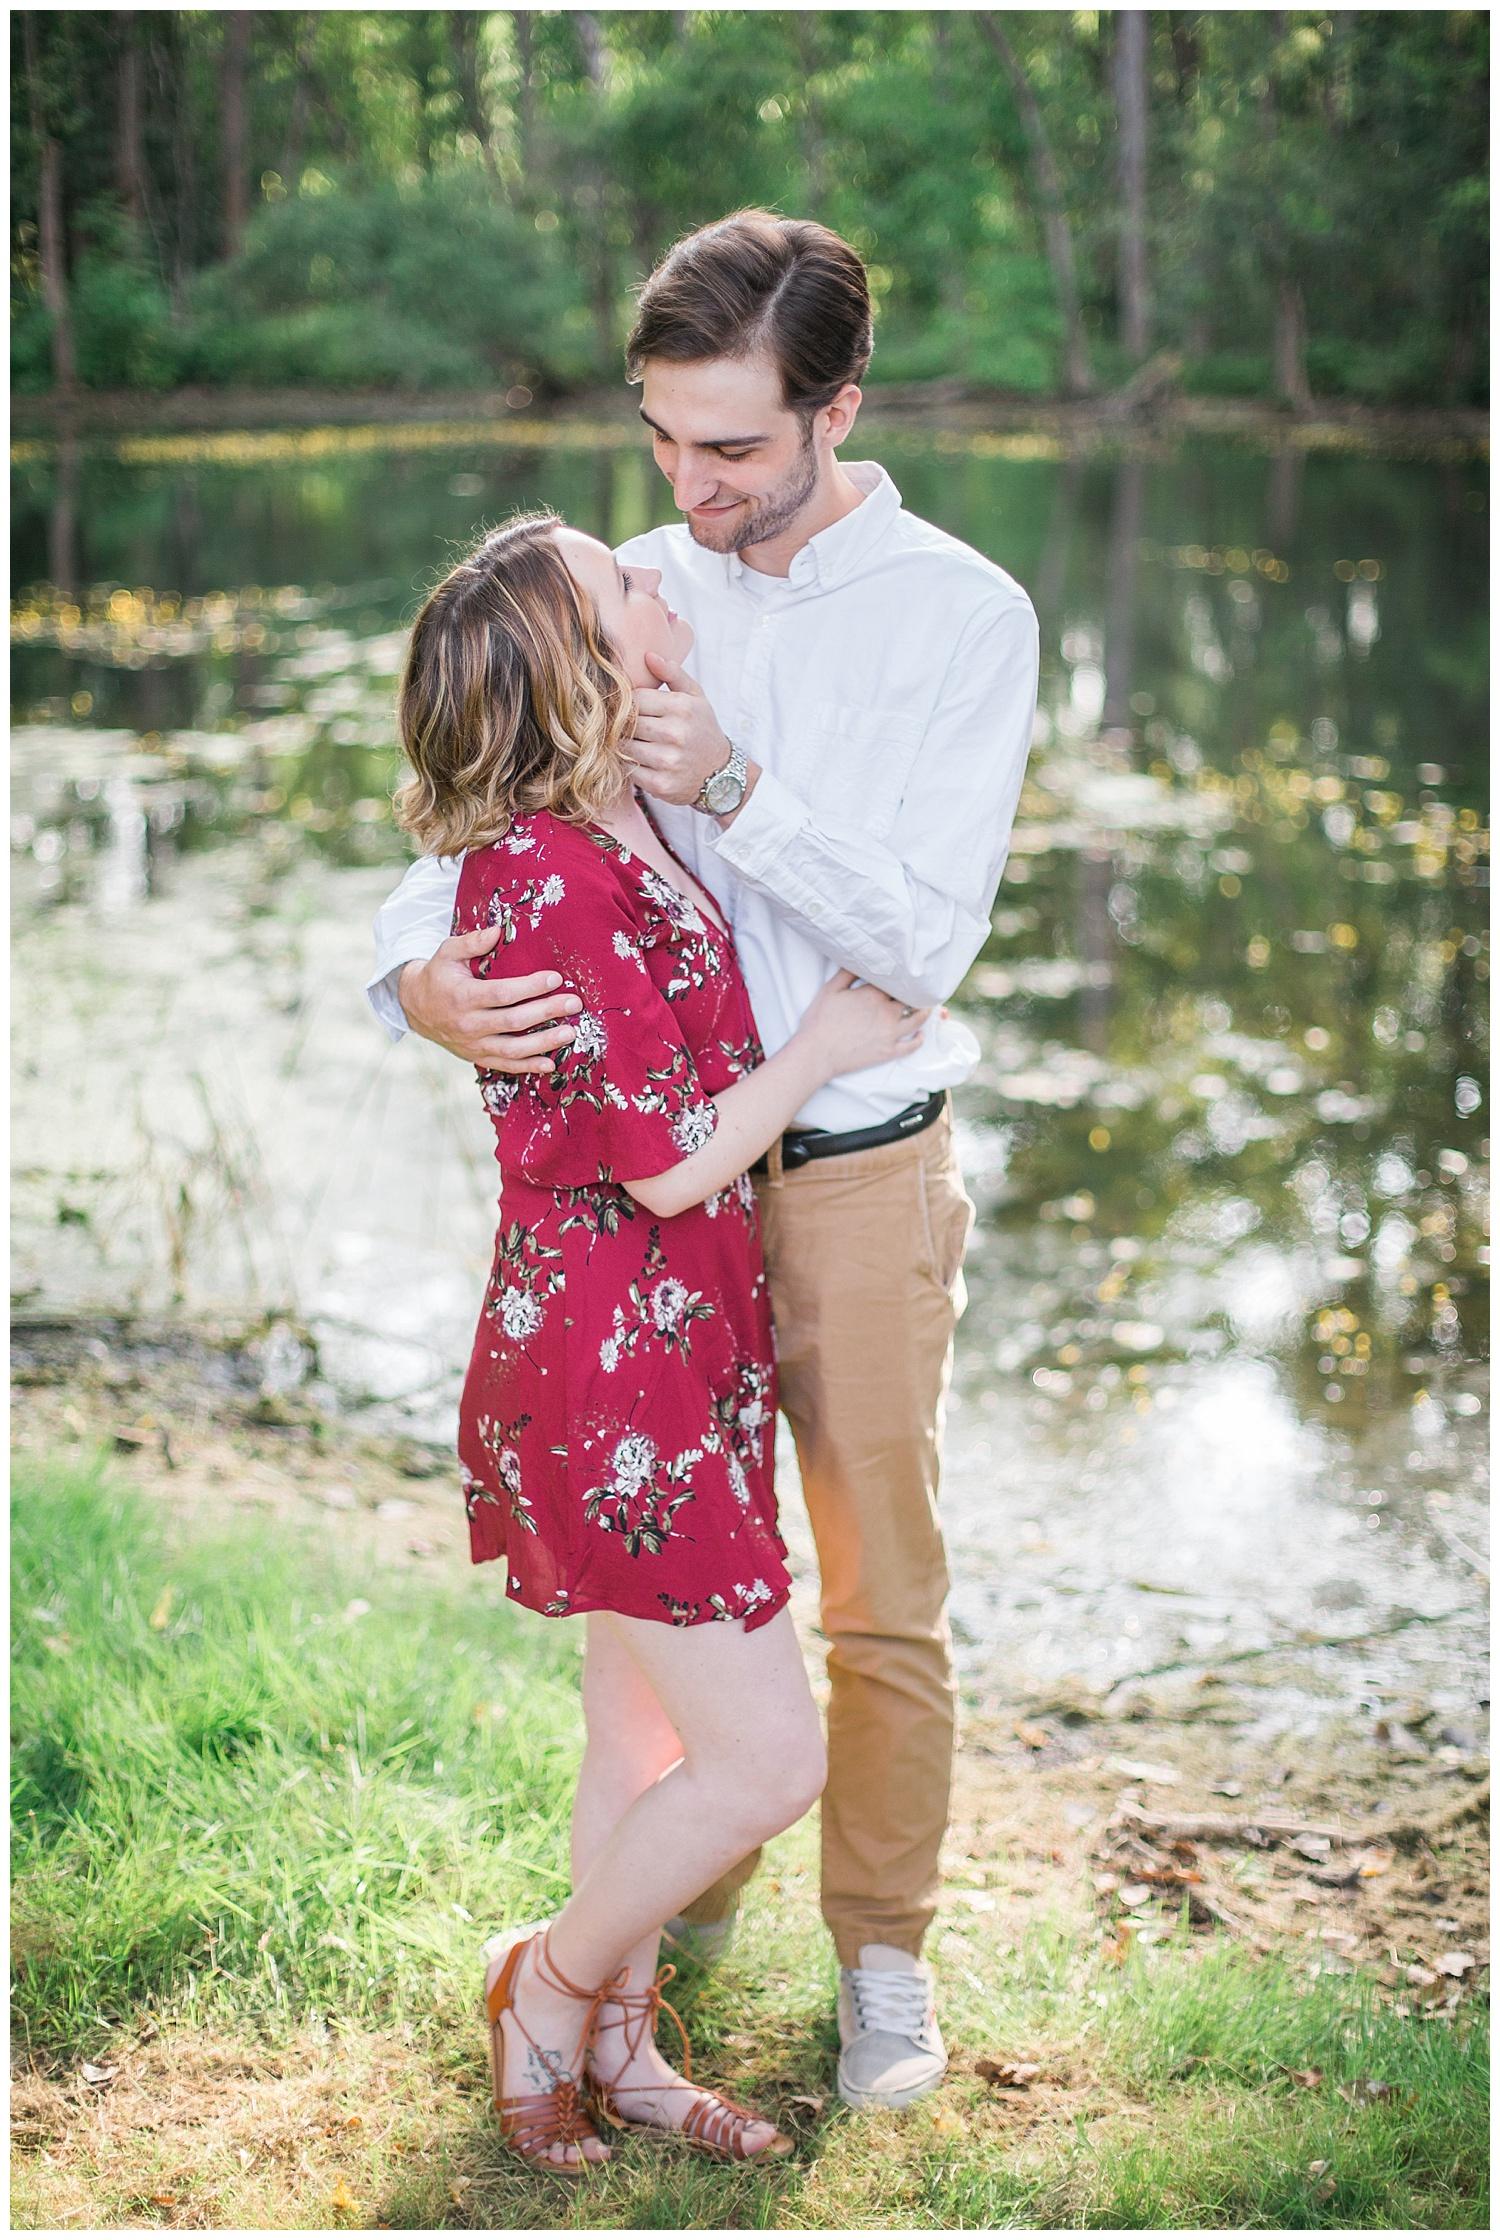 Tanya and Ryan - Sweetheart session - Lass & Beau - Geneseo NY-111_Buffalo wedding photography.jpg